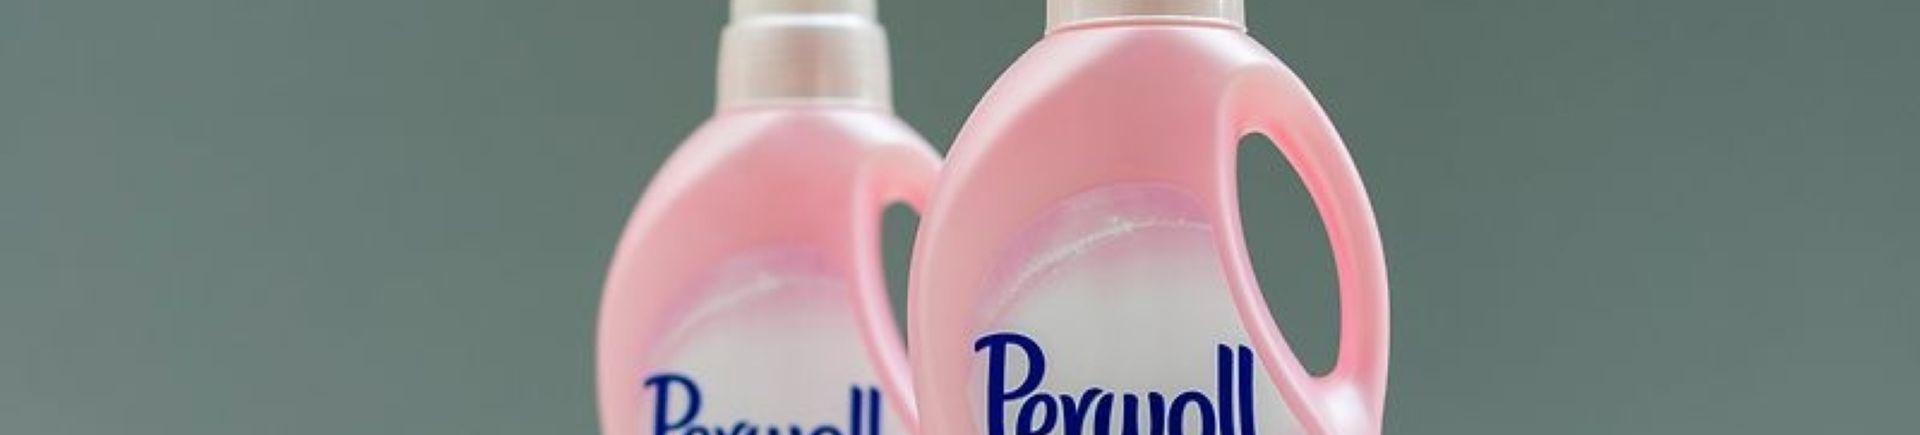 Henkel-Perwoll